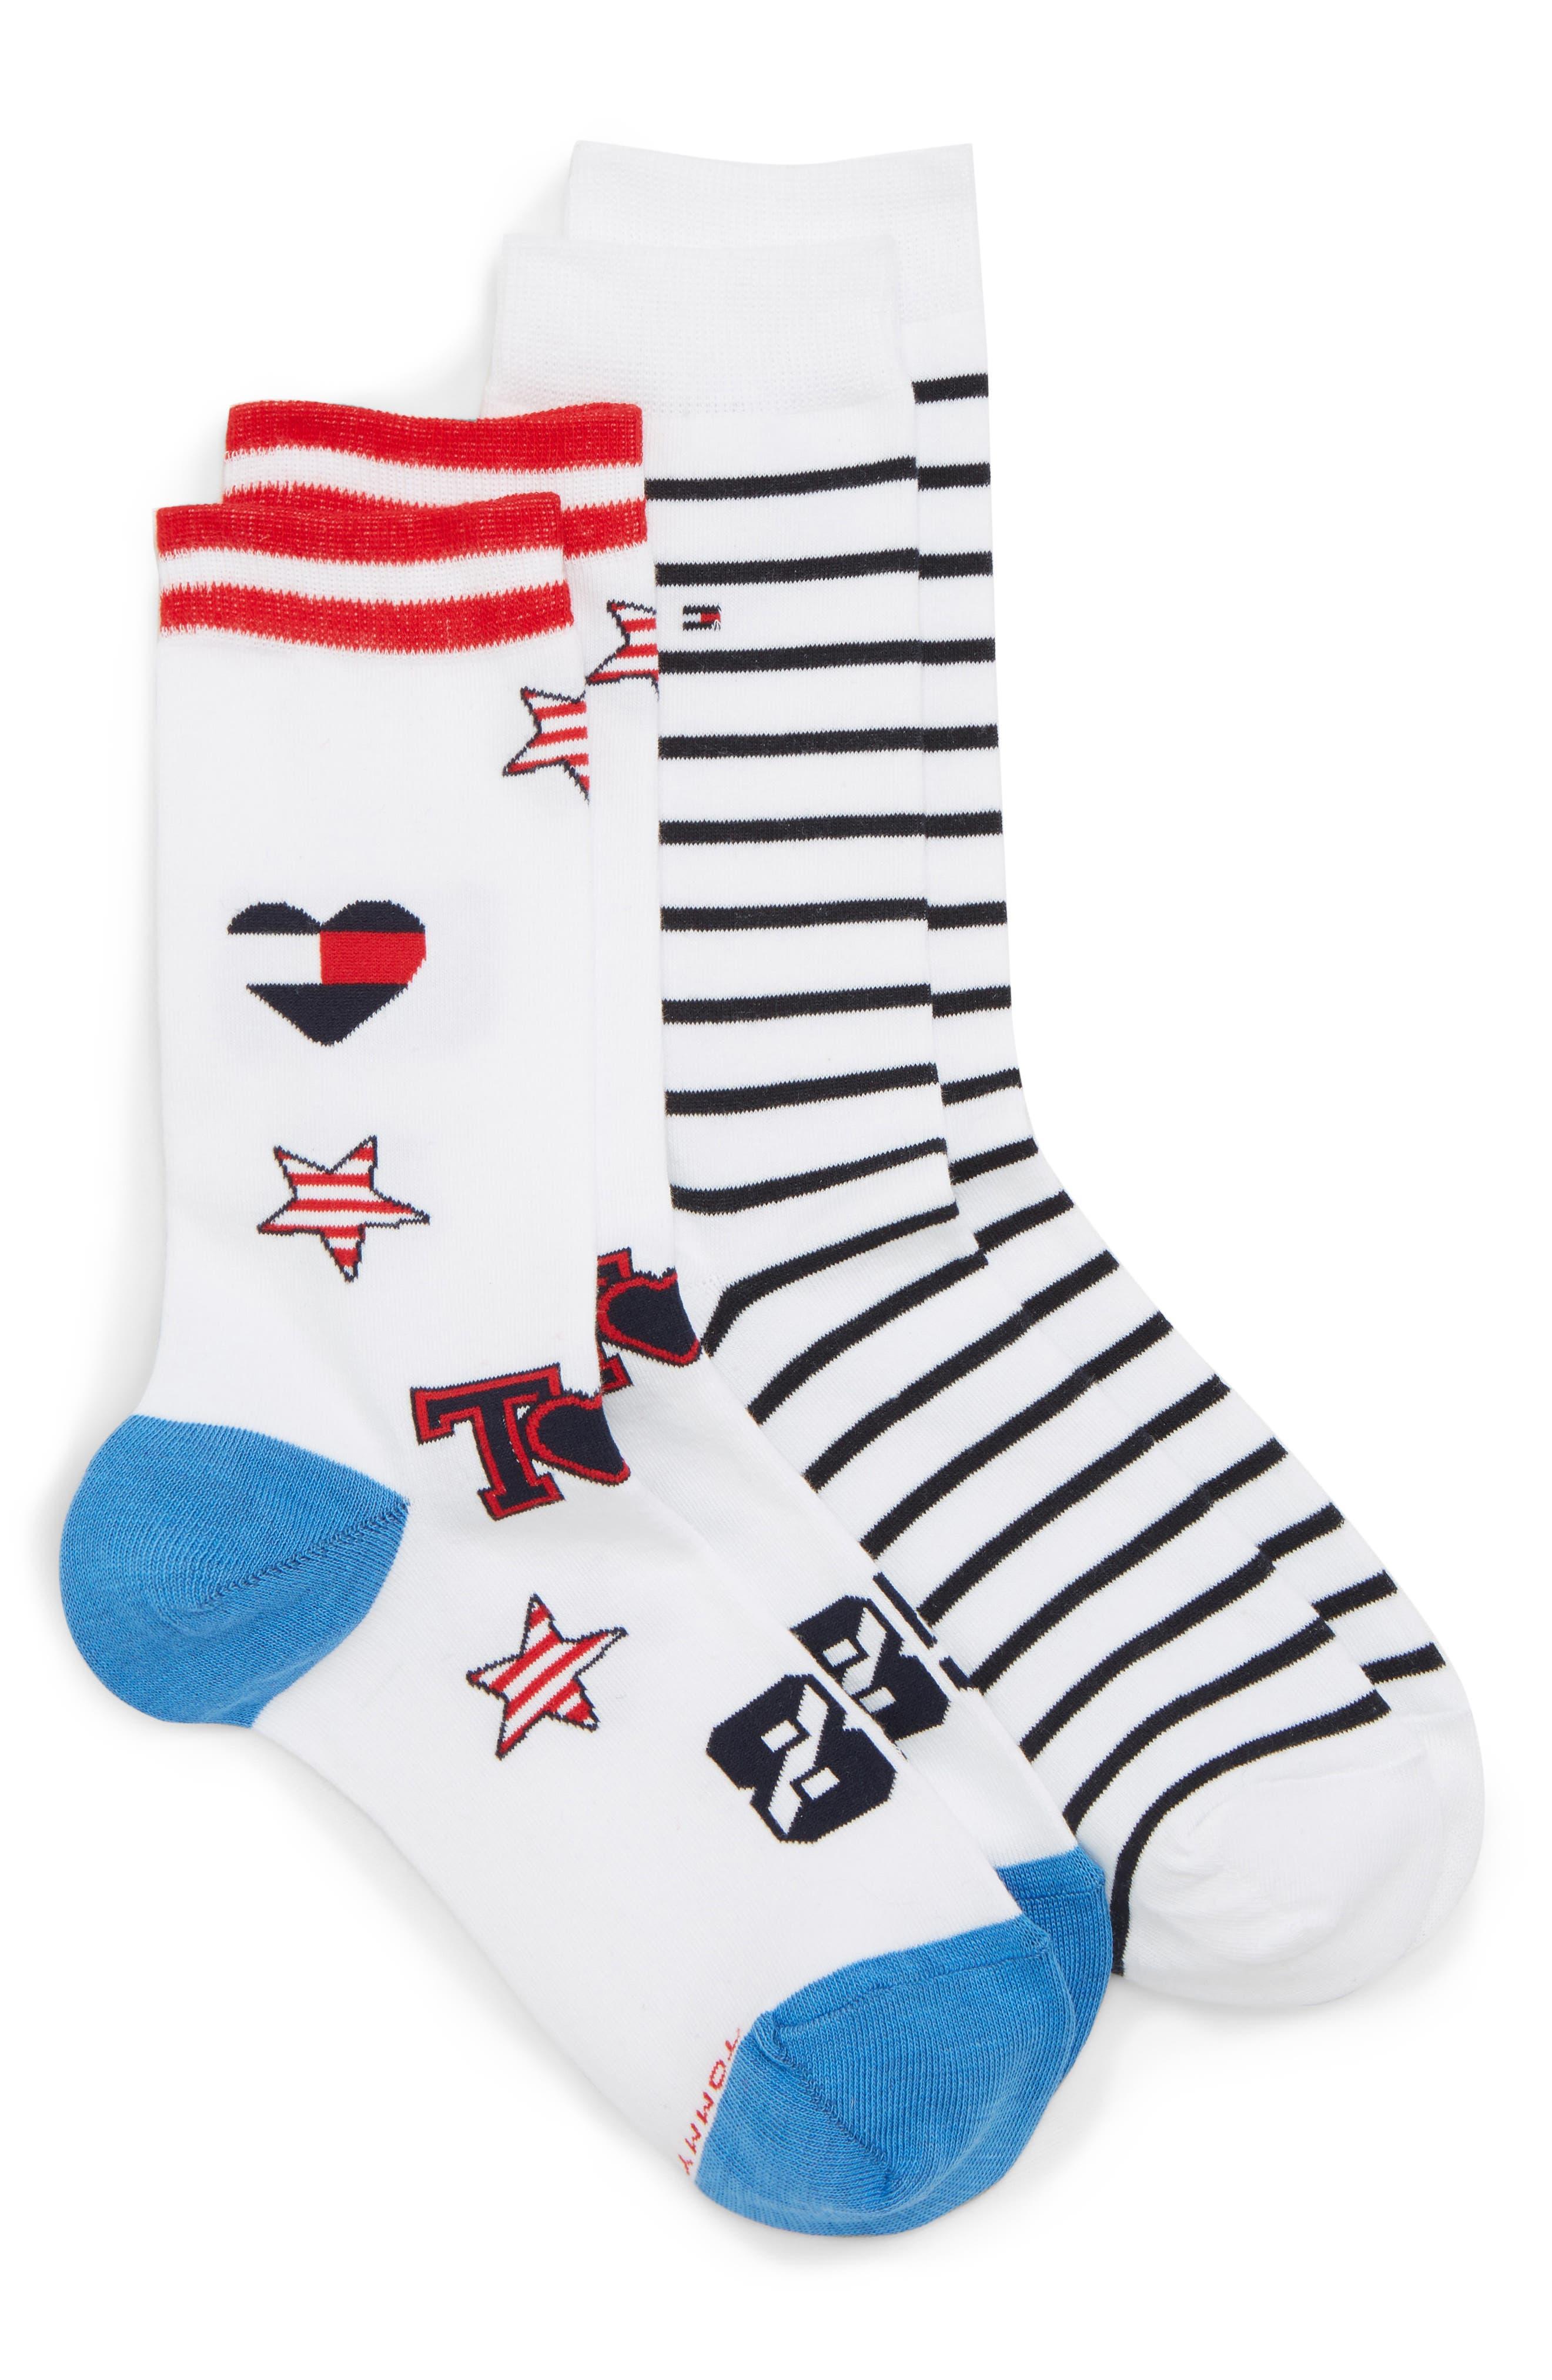 2-Pack Crew Socks,                             Main thumbnail 1, color,                             White